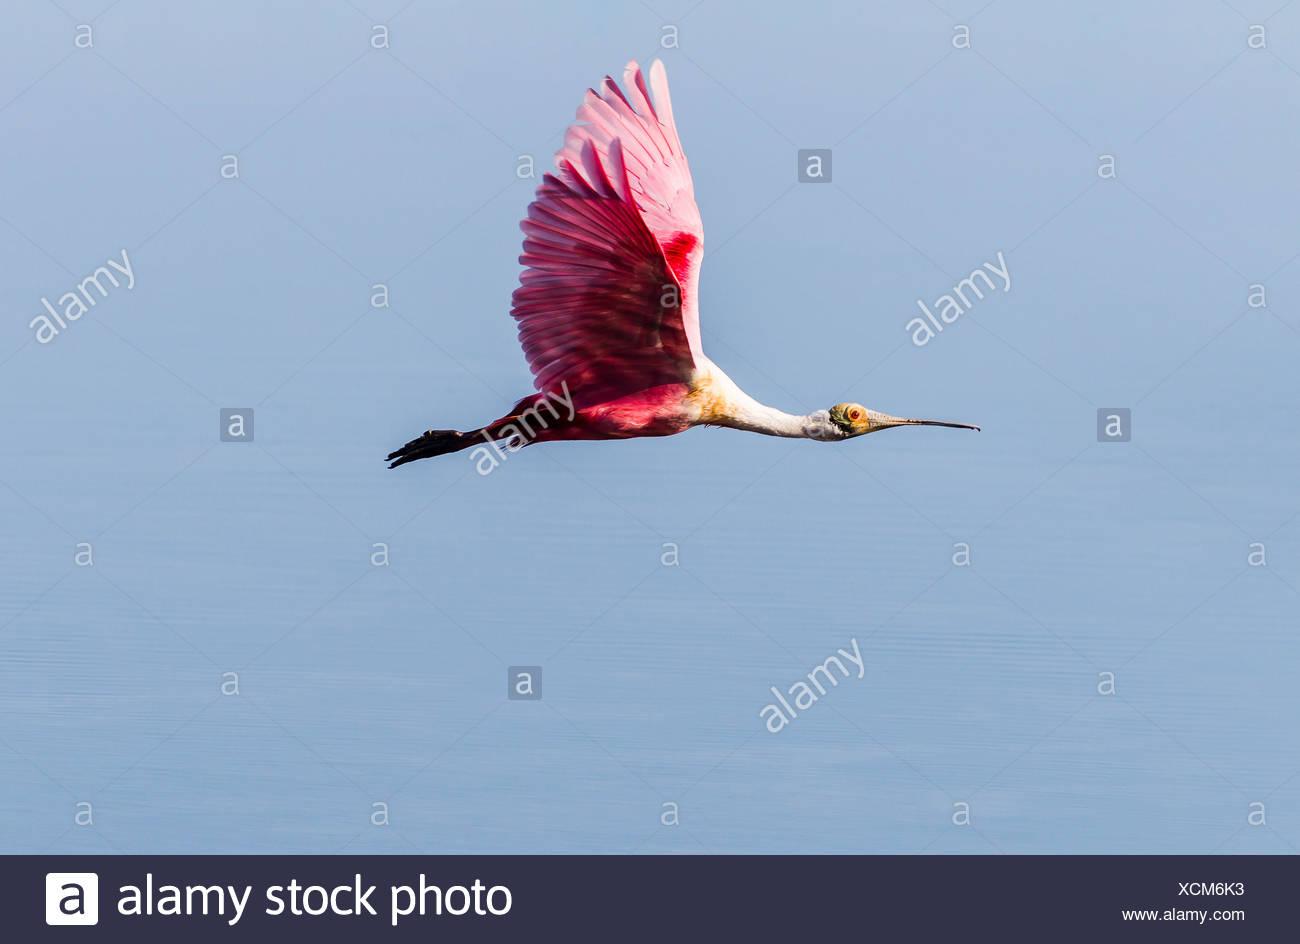 Roseate Spoonbill (Ajaia ajaja) in flight, Ding Darling National Wildlife Refuge, Sanibel Island, Florida, USA - Stock Image